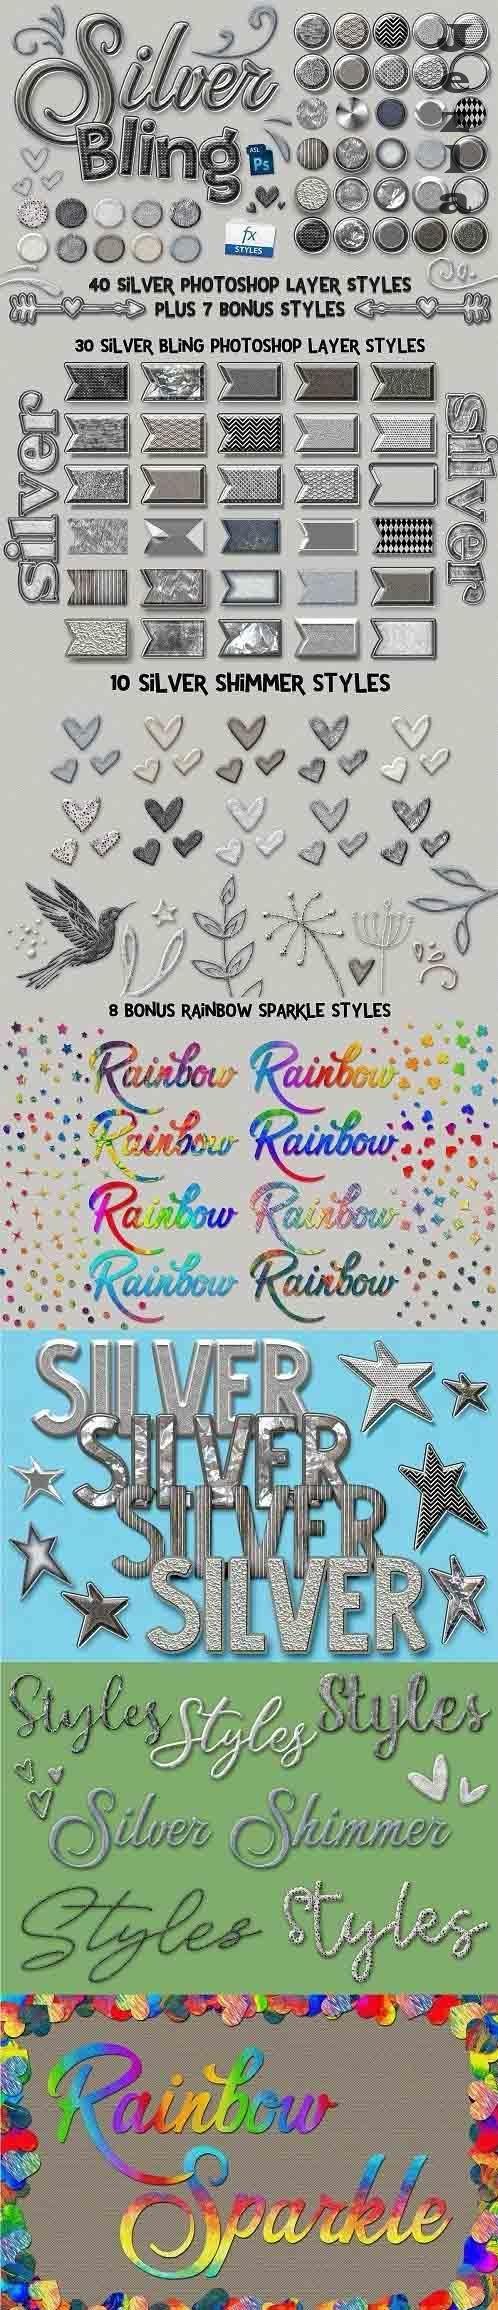 CreativeMarket - Silver Bling PHSP Layer Styles 5115002